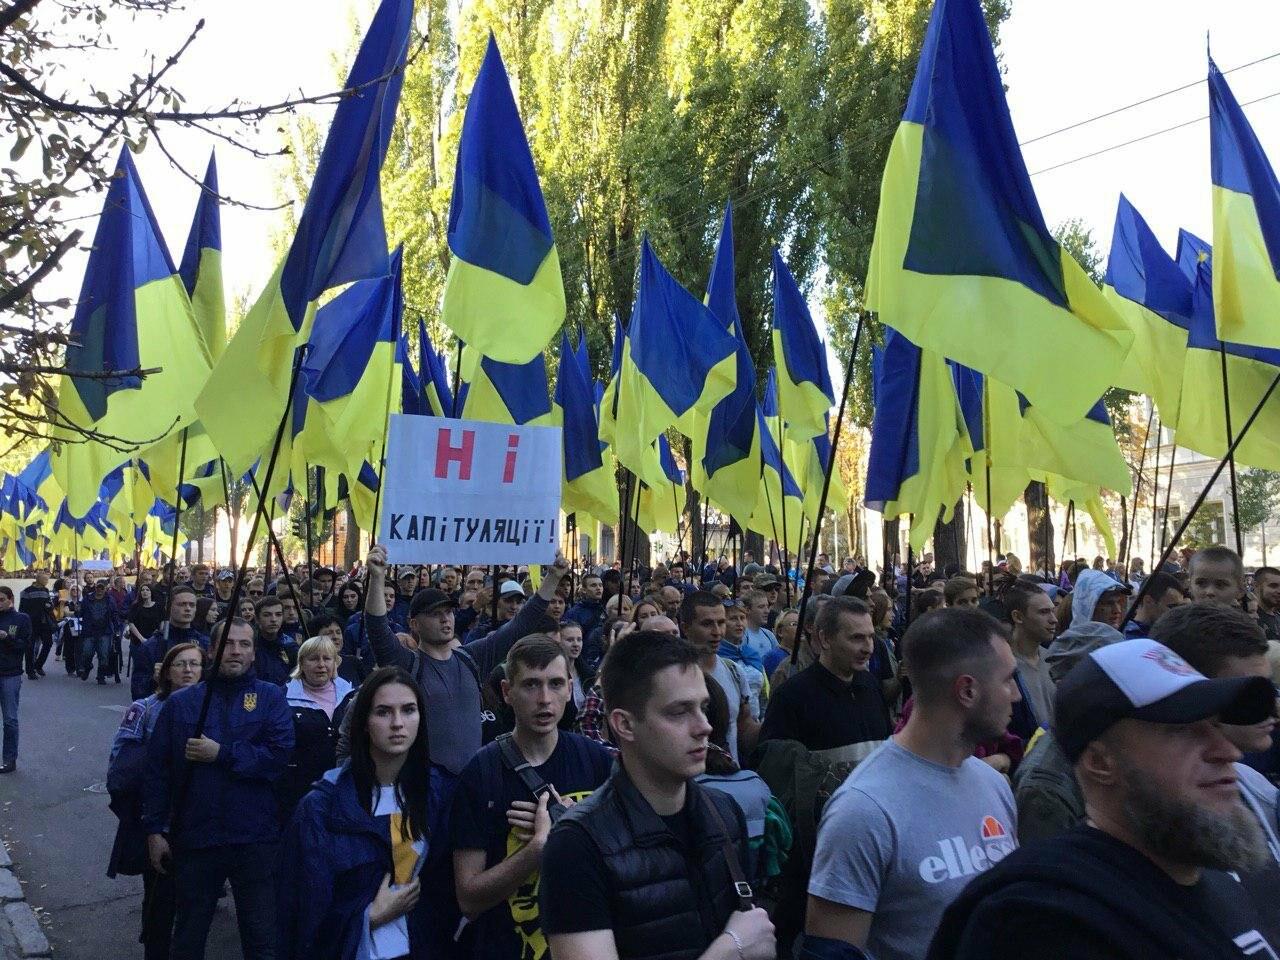 Криворожане поддержали Марш сопротивления капитуляции в Киеве, - ФОТО, ВИДЕО, ОБНОВЛЕНО, фото-11